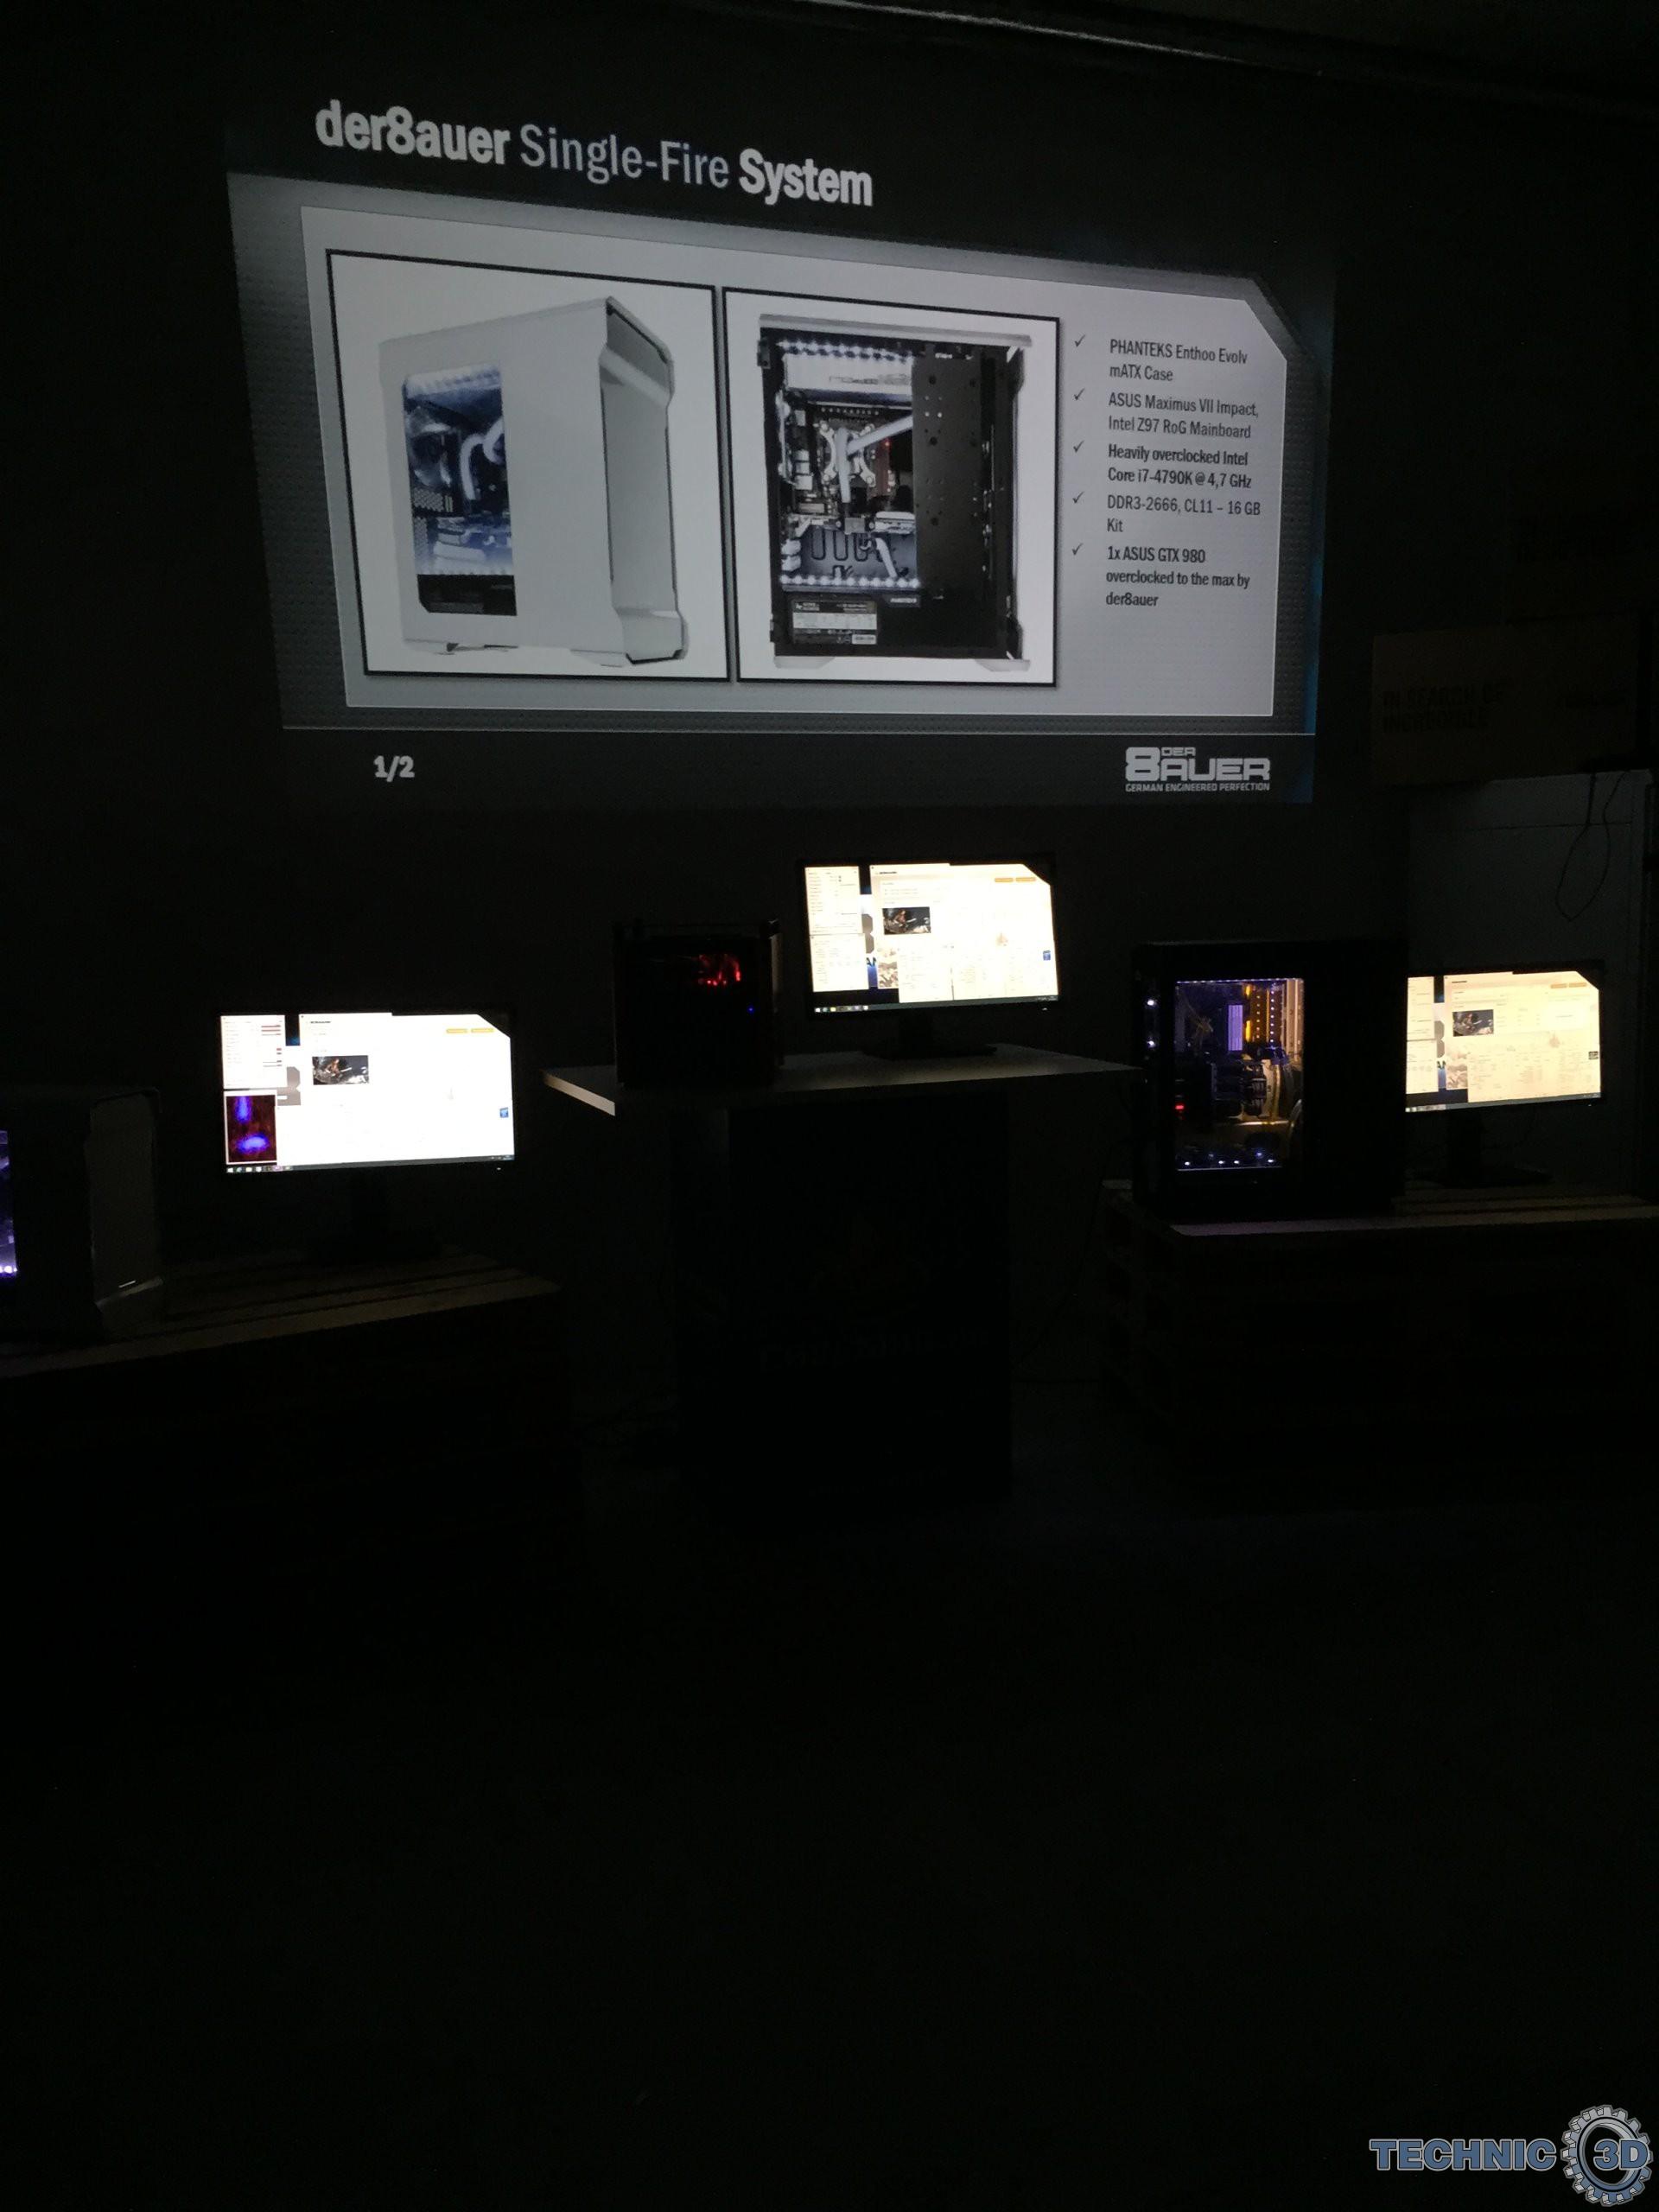 der8auer king mod systeme bei caseking news technic3d. Black Bedroom Furniture Sets. Home Design Ideas